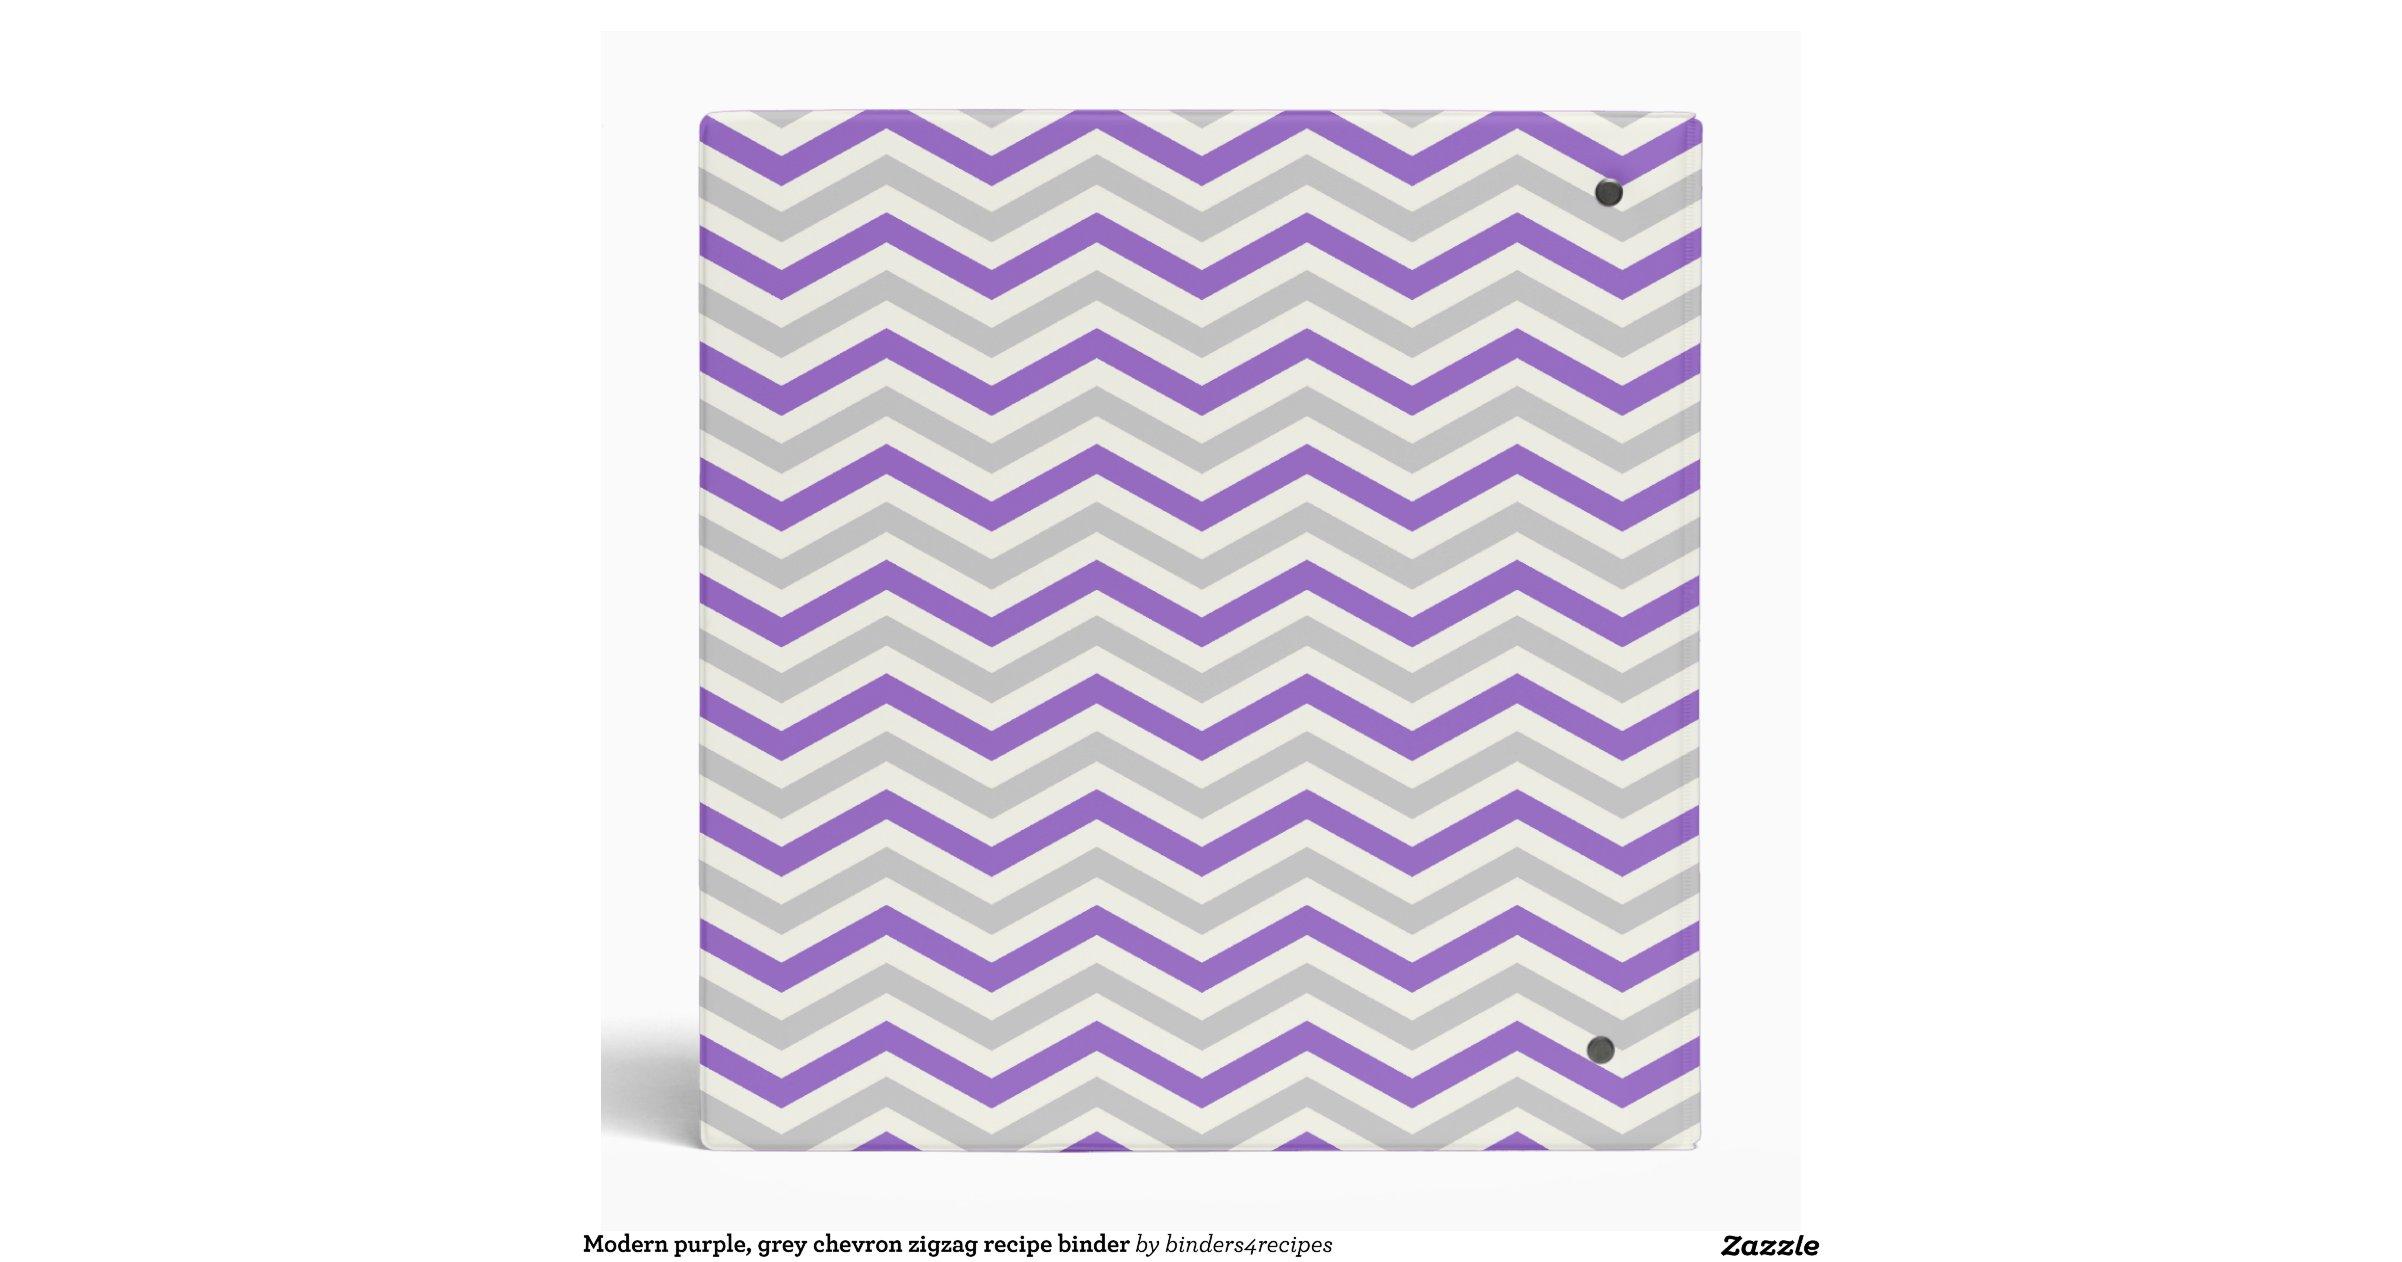 modern_purple_grey_chevron_zigzag_recipe_binder ...